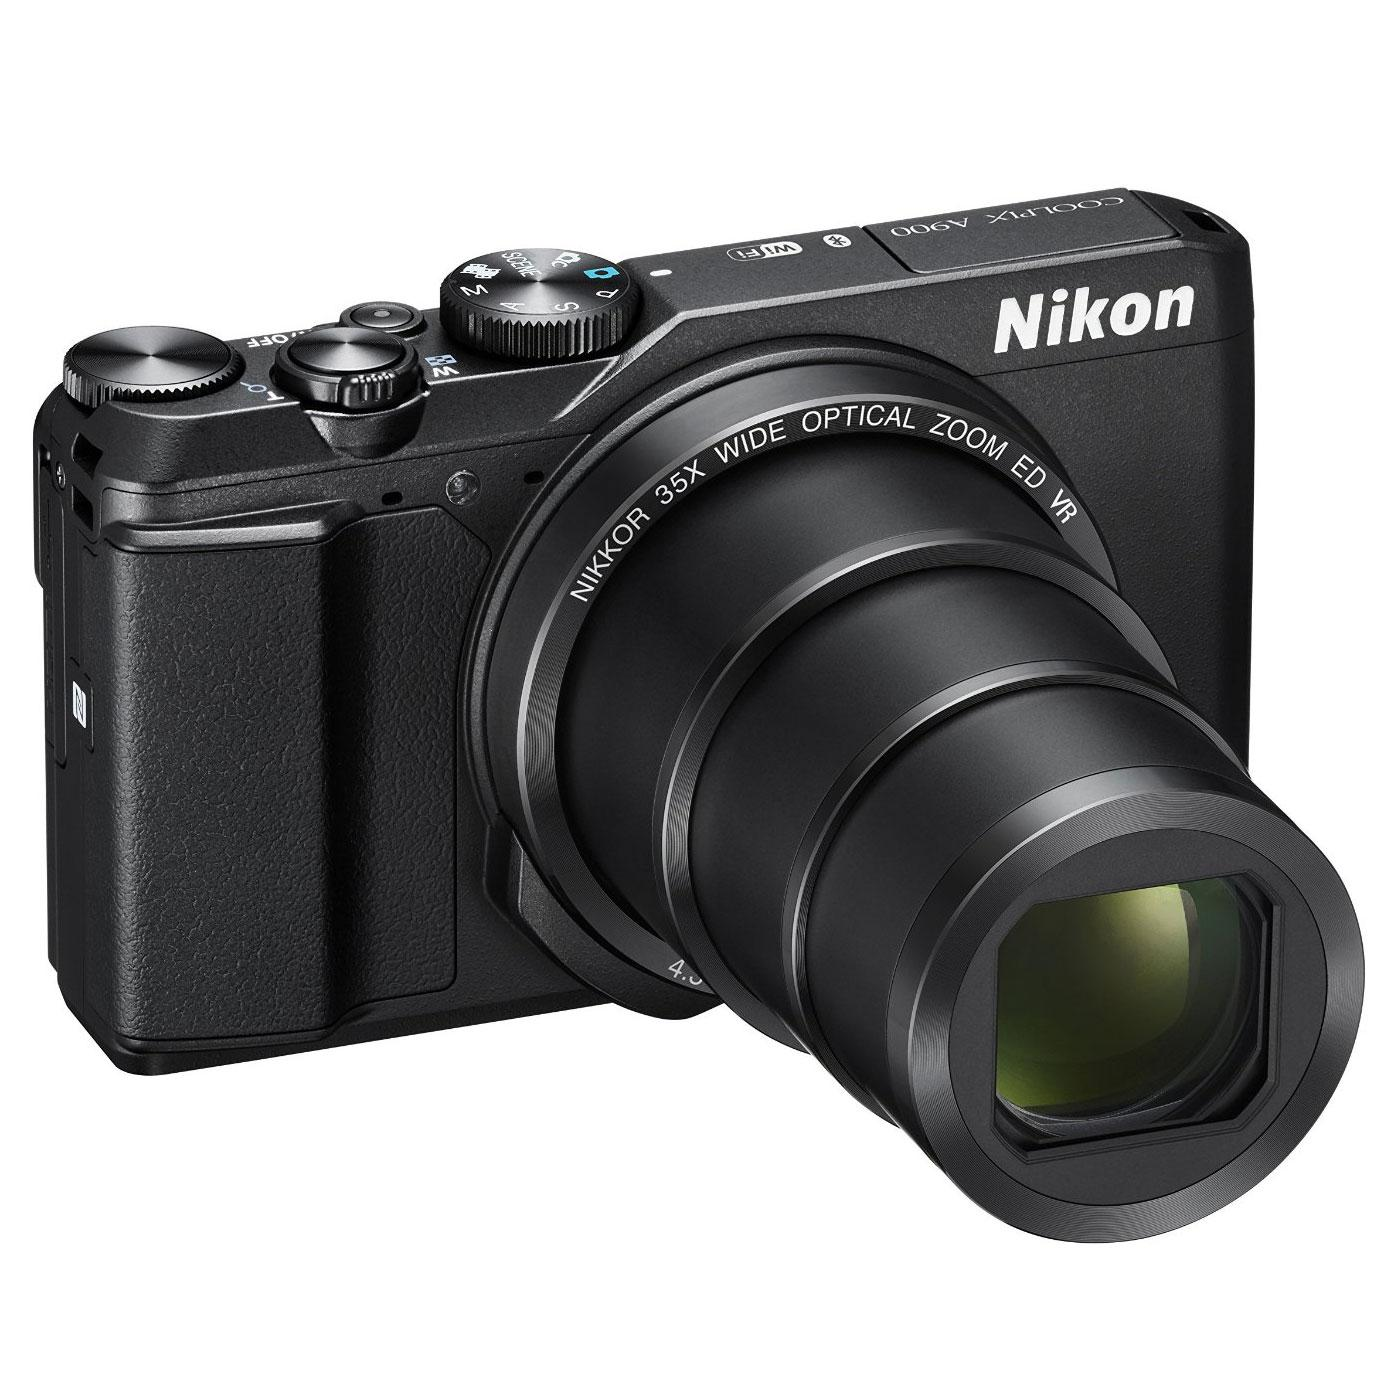 Nikon Coolpix A900 COMPACT WIFI DIGITAL CAMERA 20MP